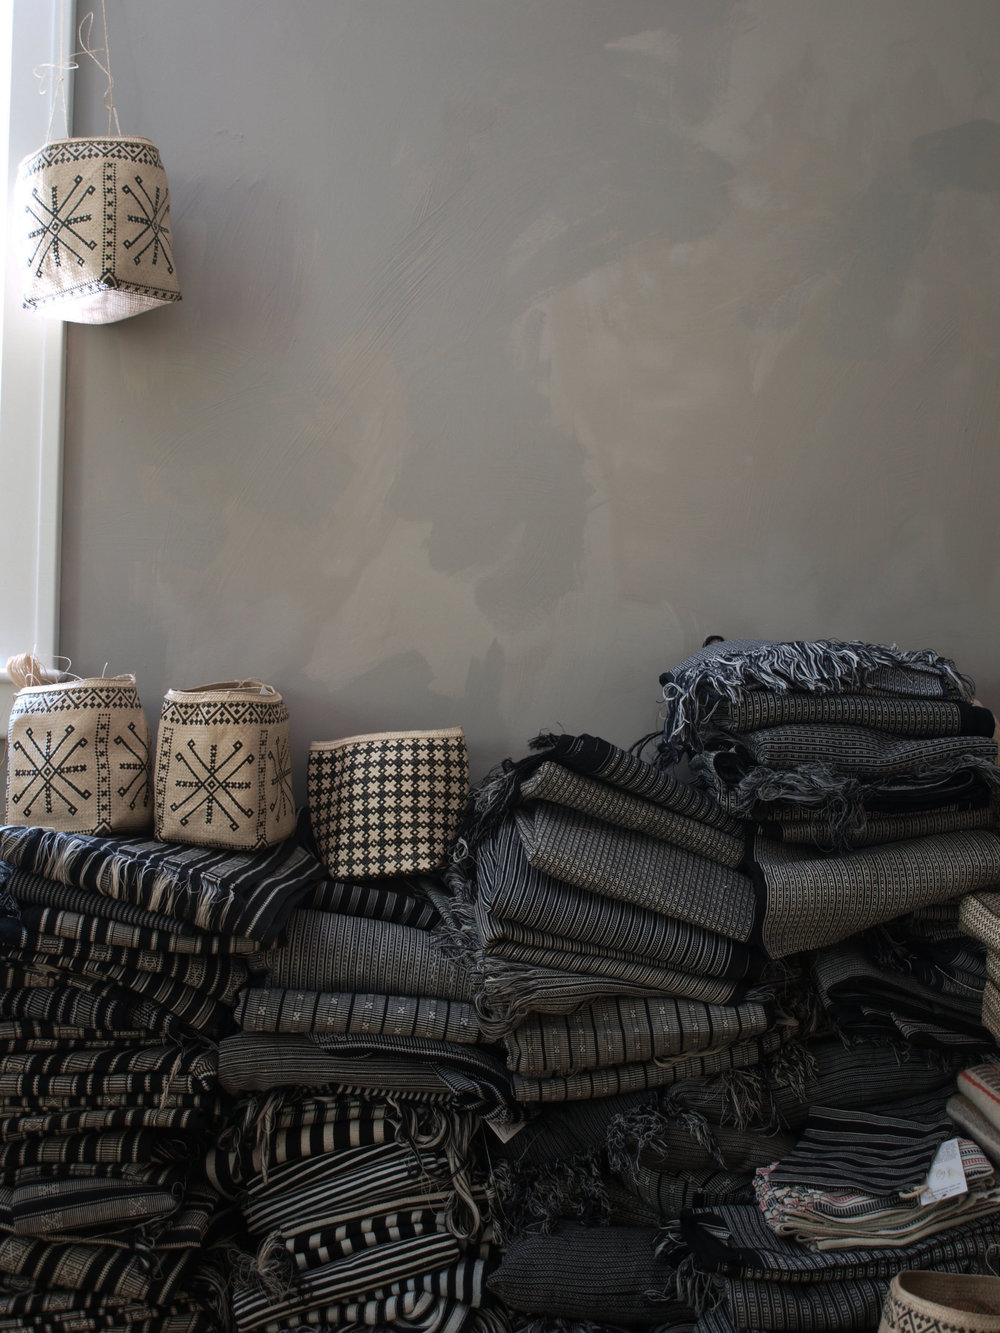 handa_textiles_studio - 2.jpg